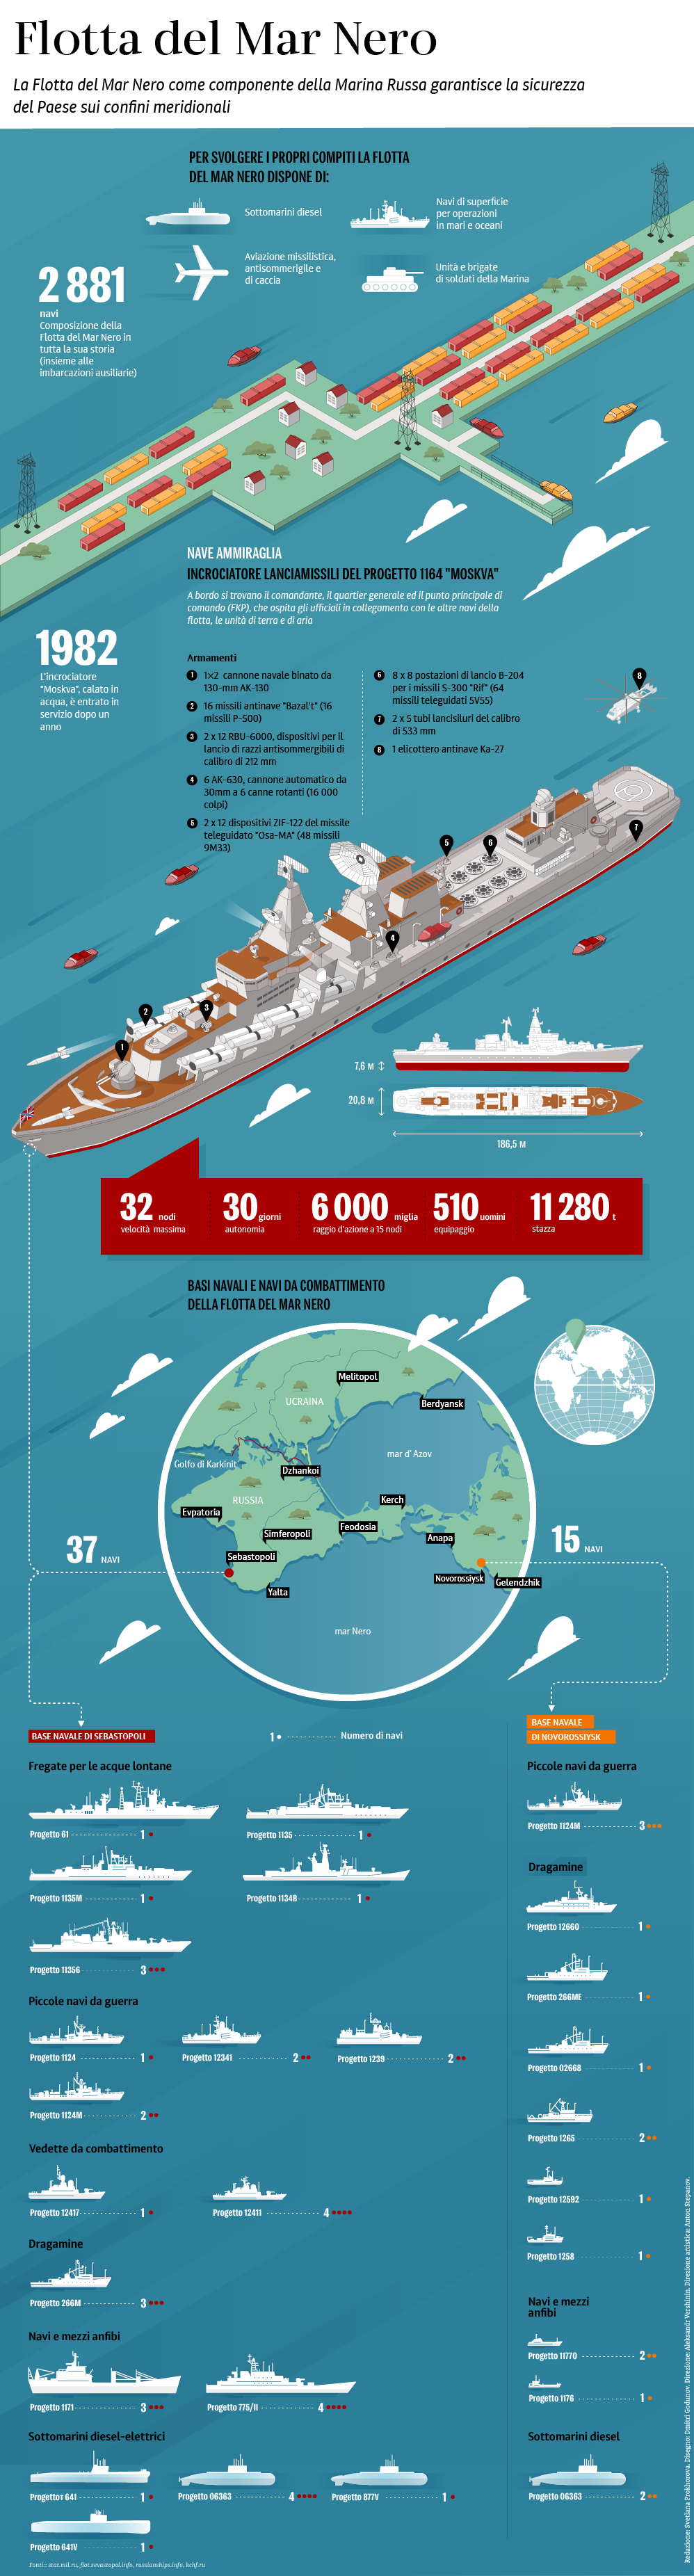 Flotta del Mar Nero, infografica